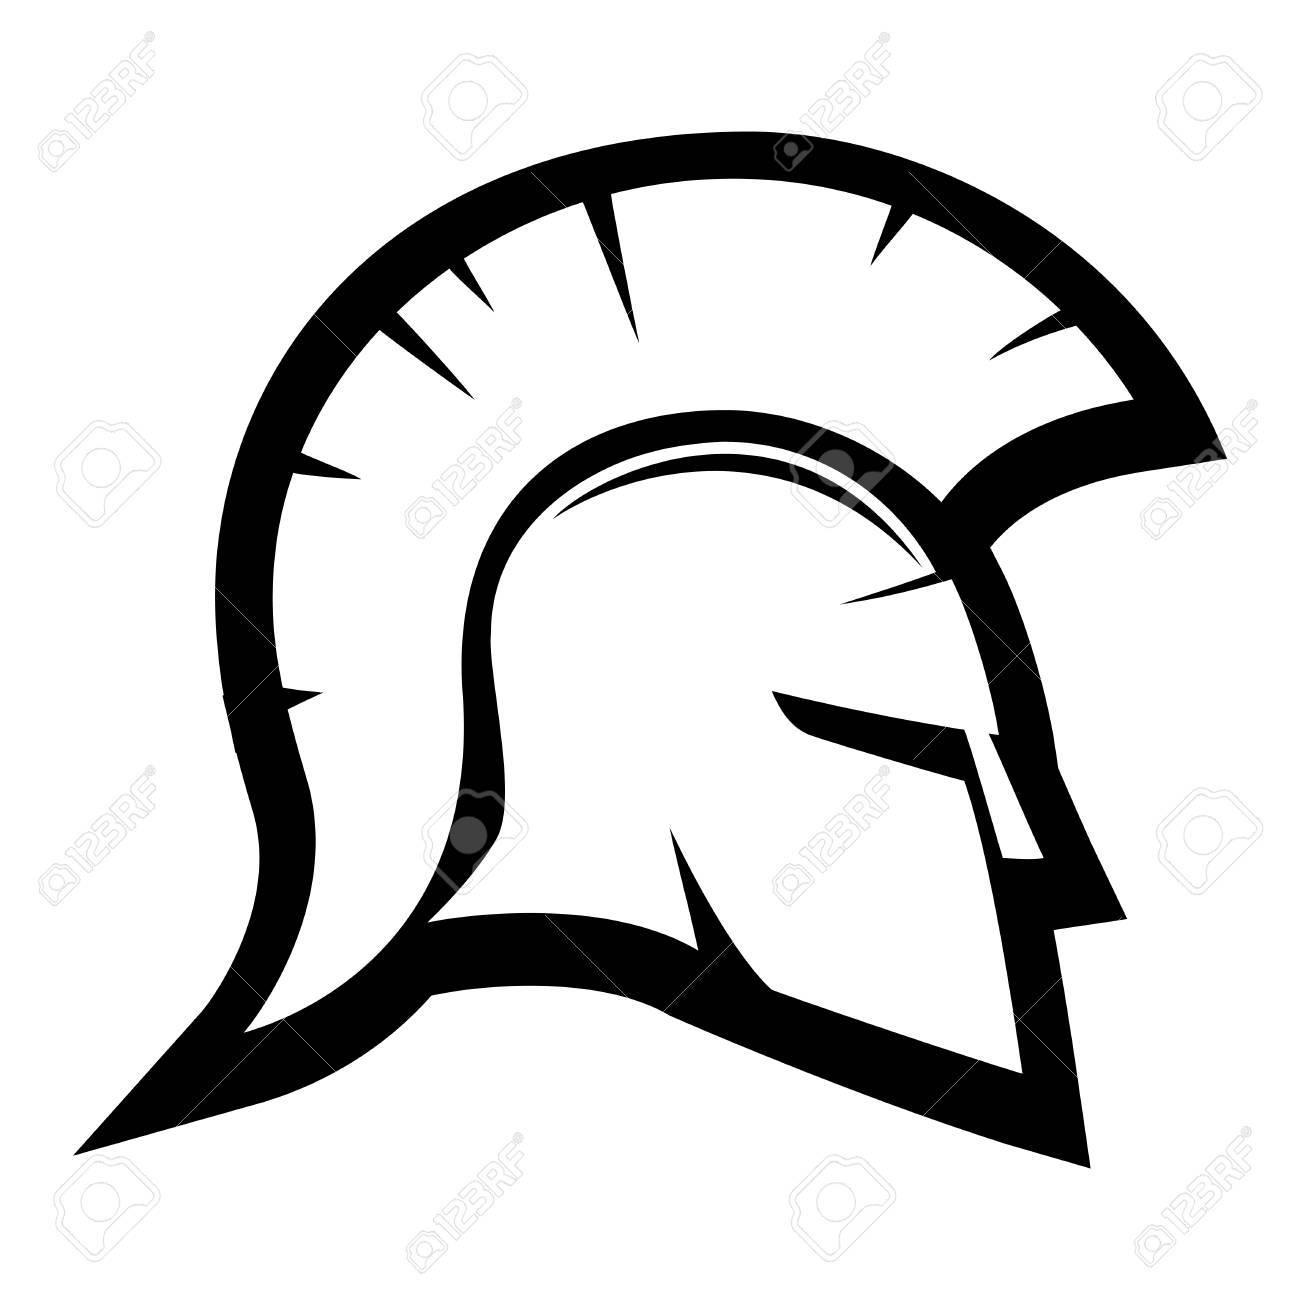 1300x1300 Spartan Helmet. Royalty Free Cliparts, Vectors, And Stock